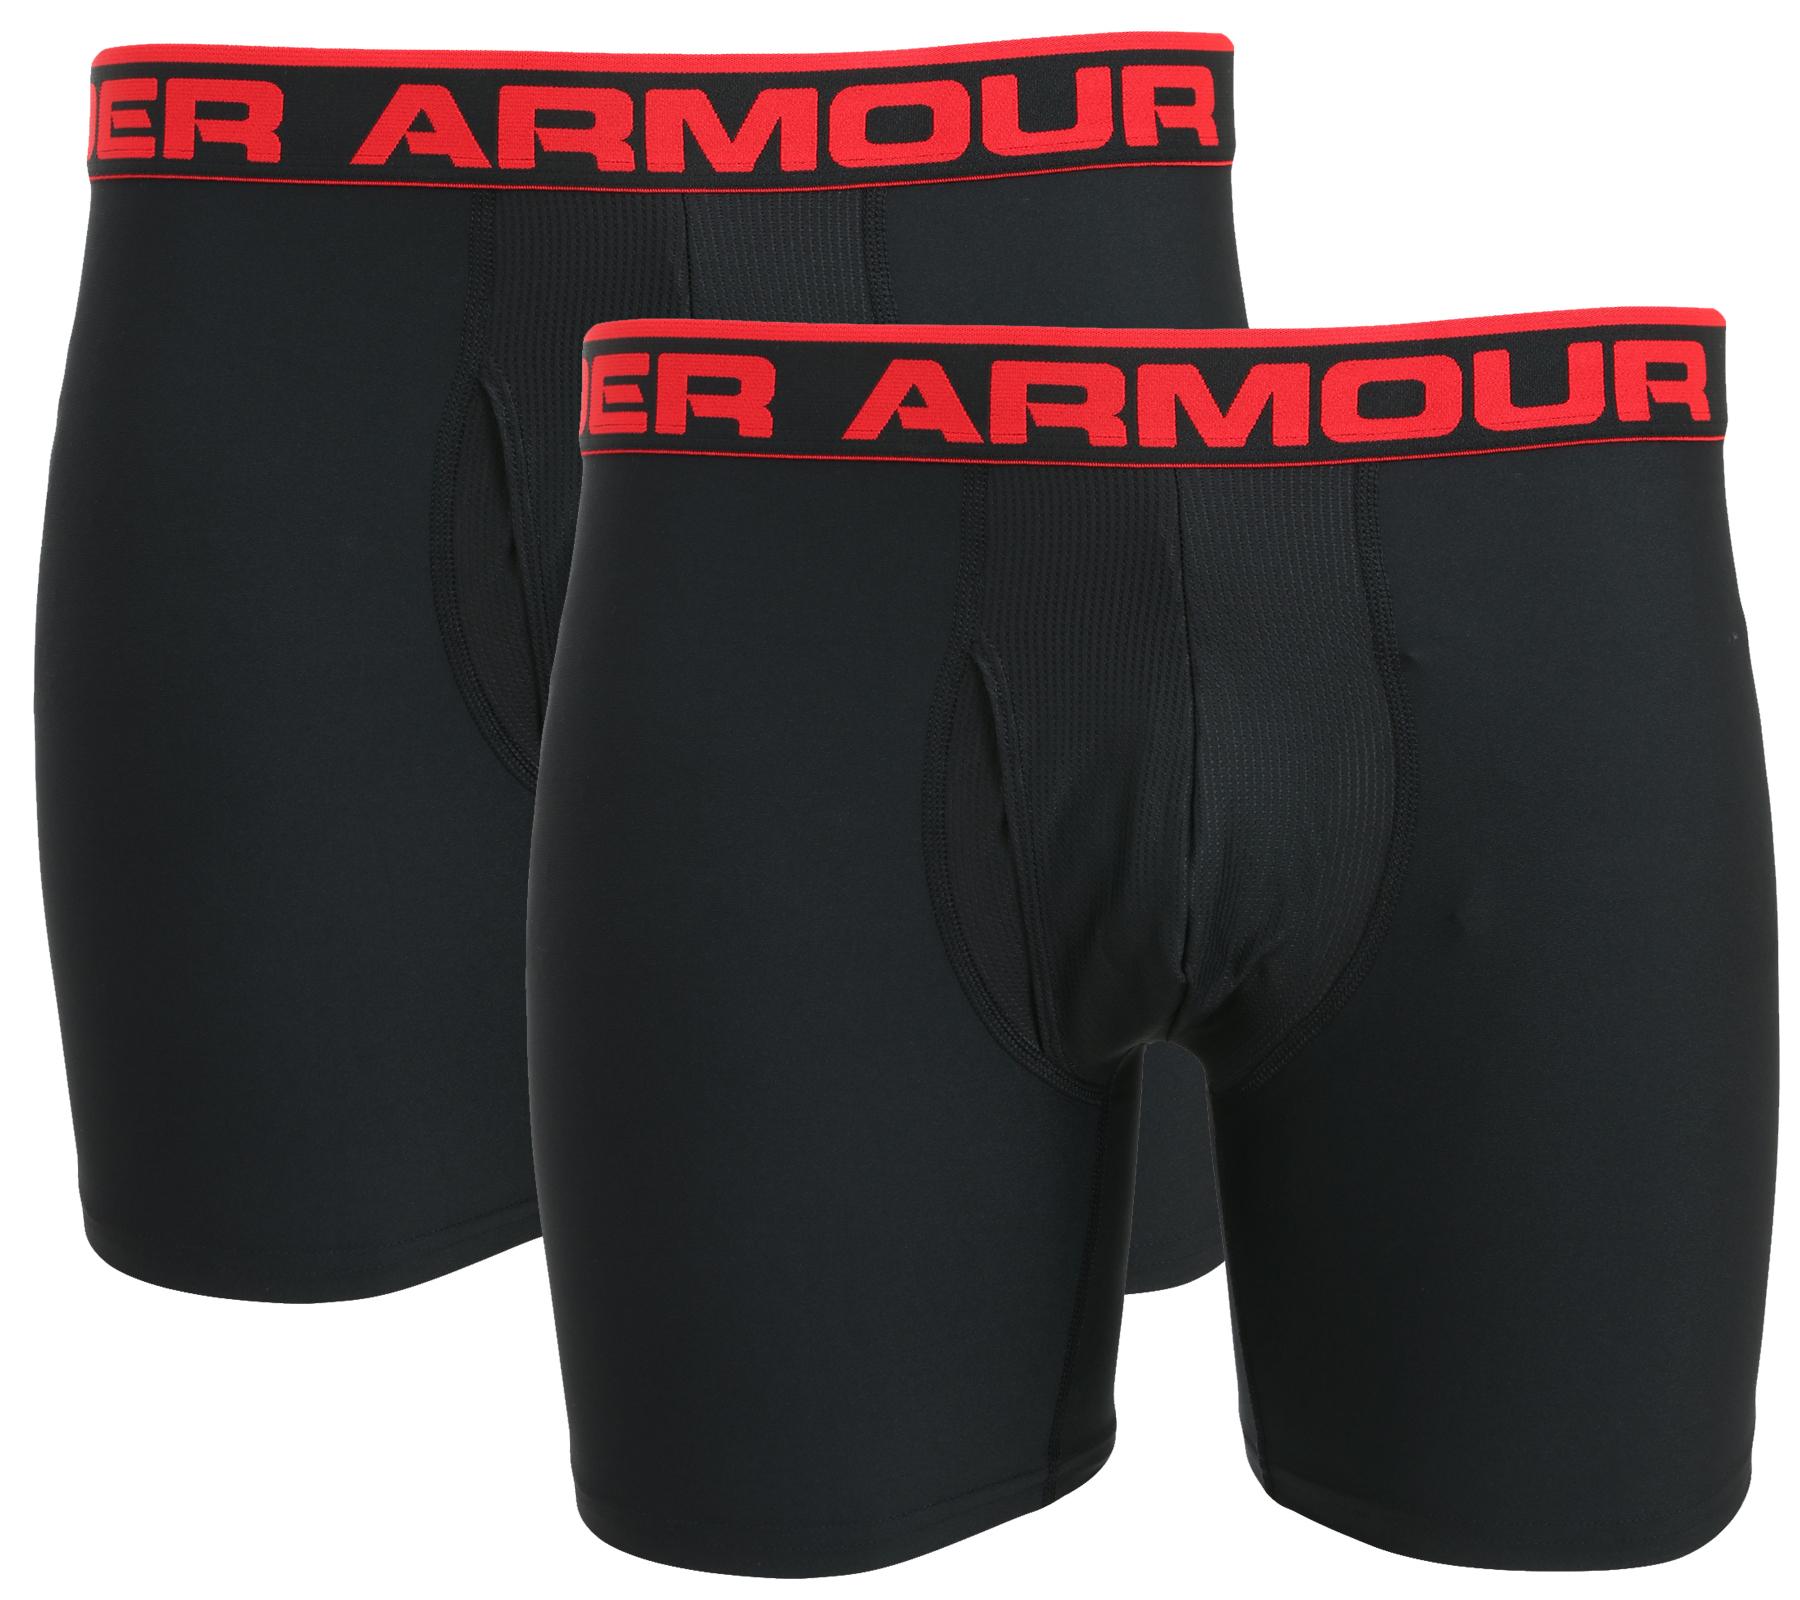 Under Armour Doppelpack Boxerjock Gr. S-XL bei Outlet46